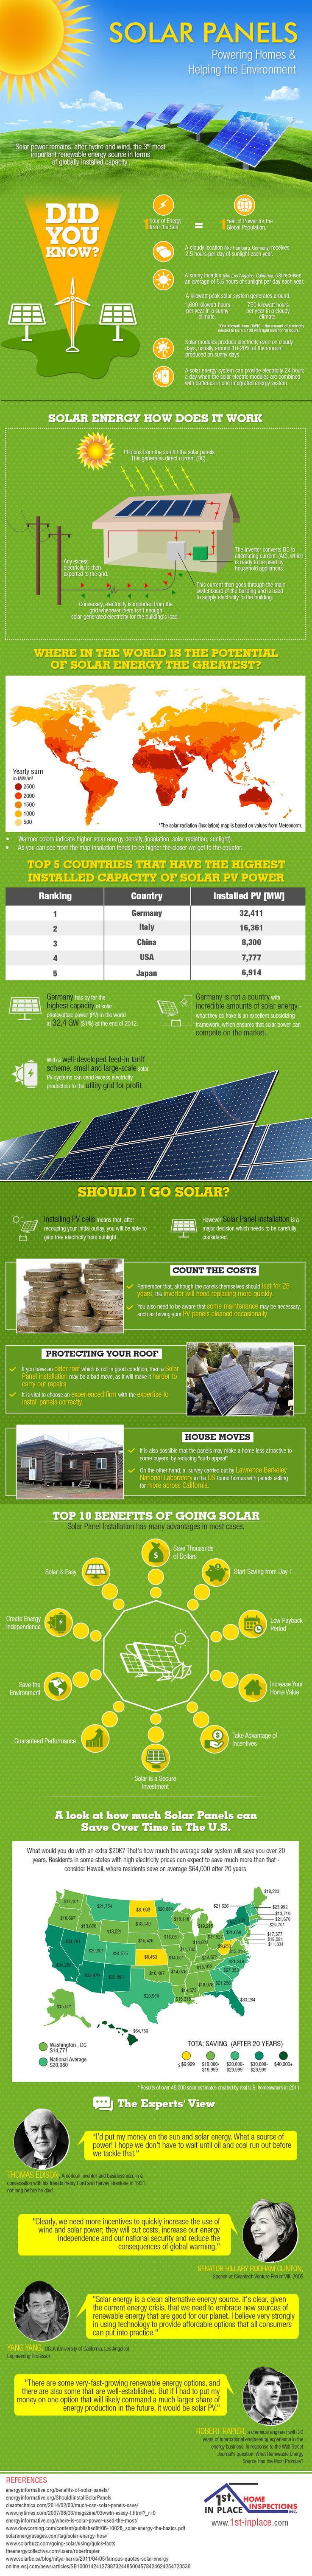 Advantages Of Solar Energy Infographic | Blog | 123SolarPower